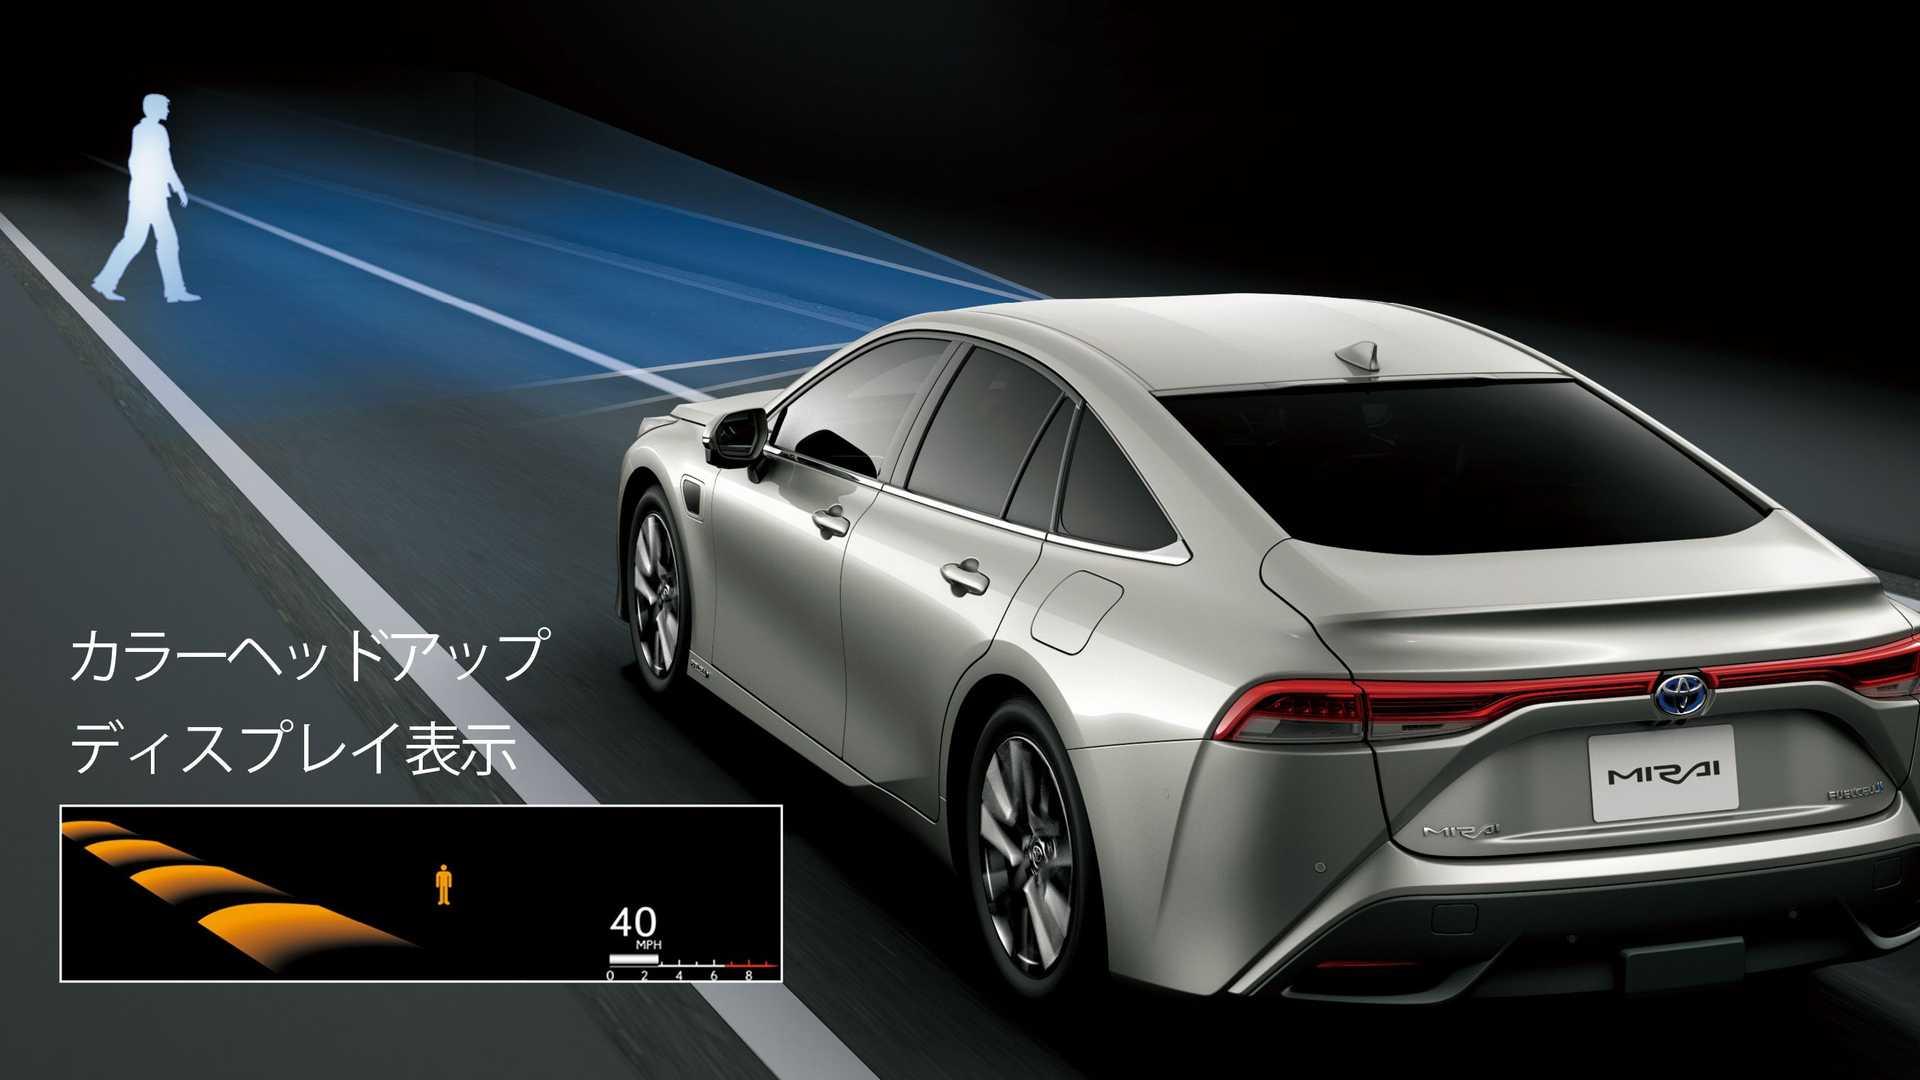 Lexus-LS-And-Toyota-Mirai-Advanced-Drive-25